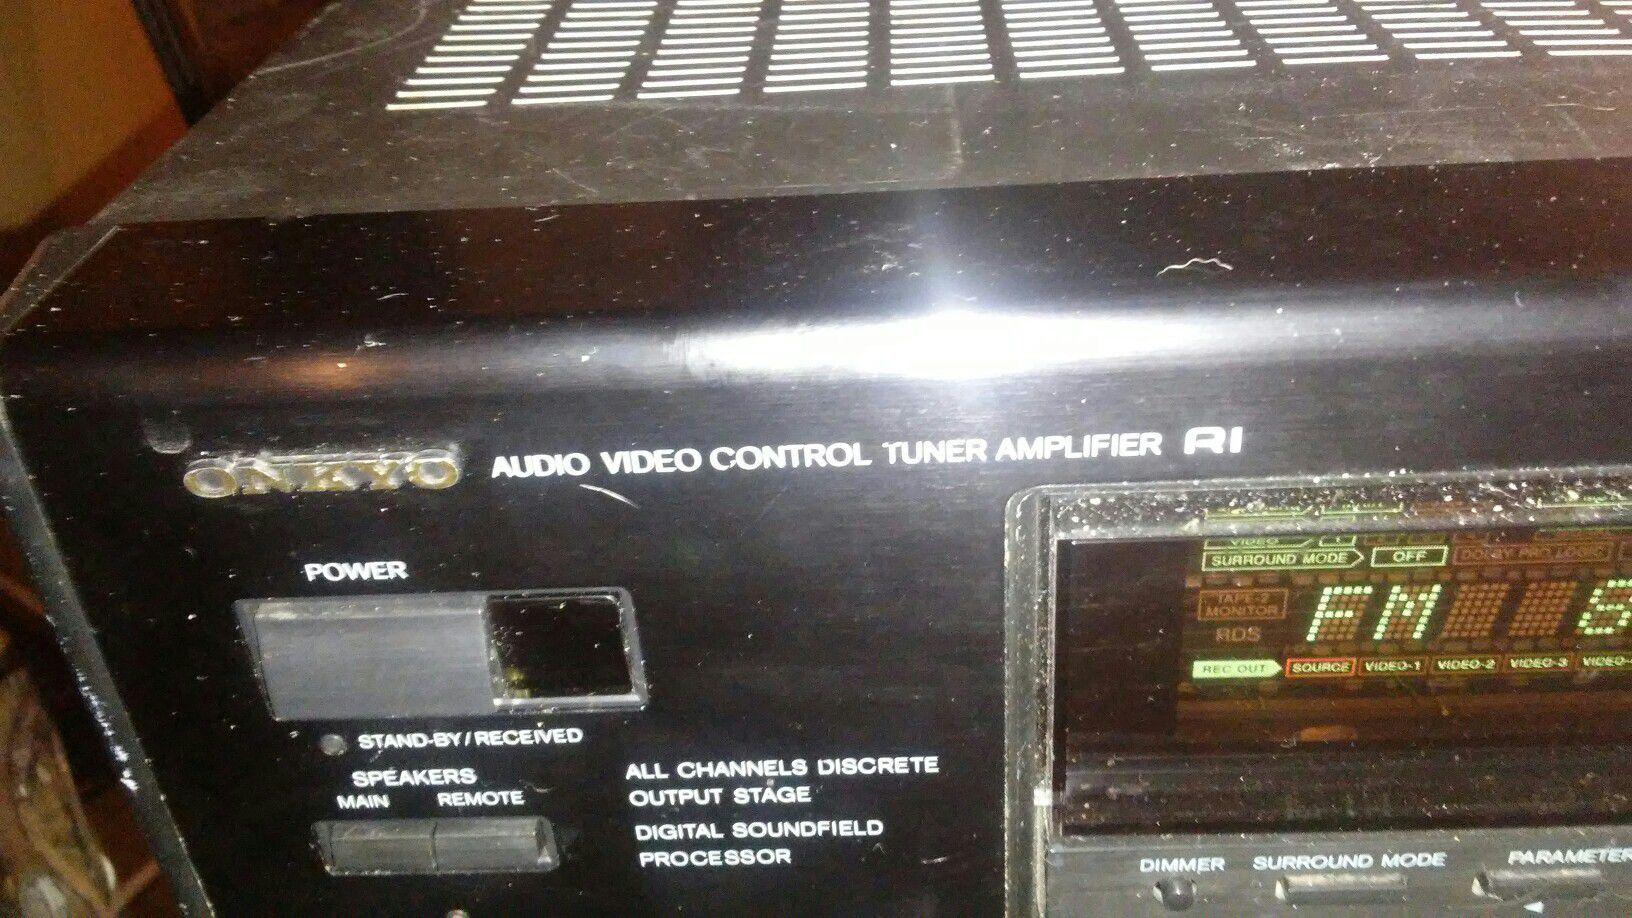 Onkyo audio video control tuner amplifier